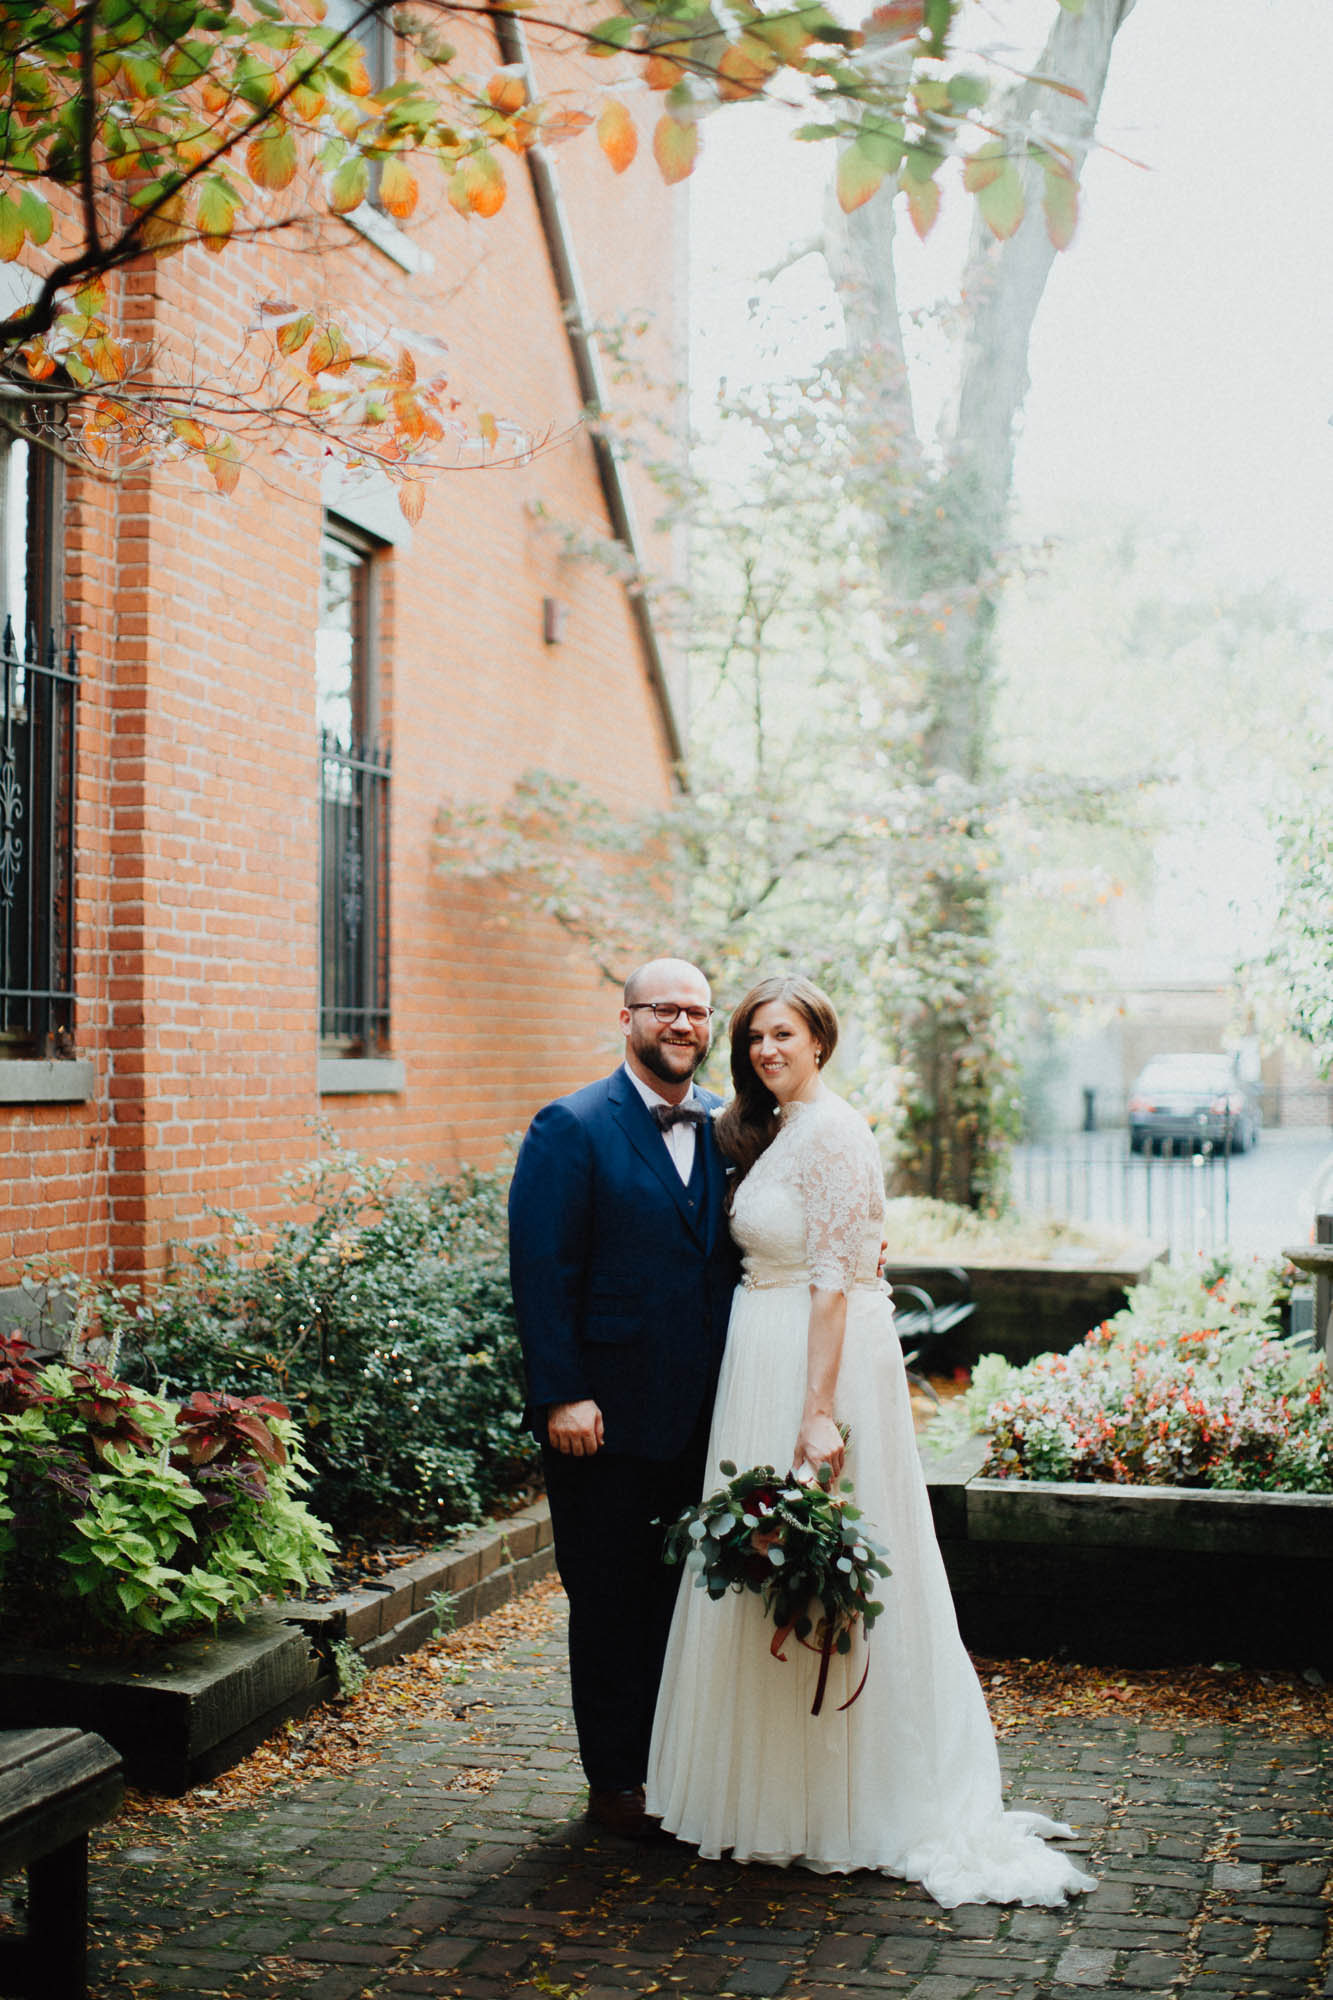 Highline-Car-House-Wedding-Columbus-Kristin-Aaron-028.jpg